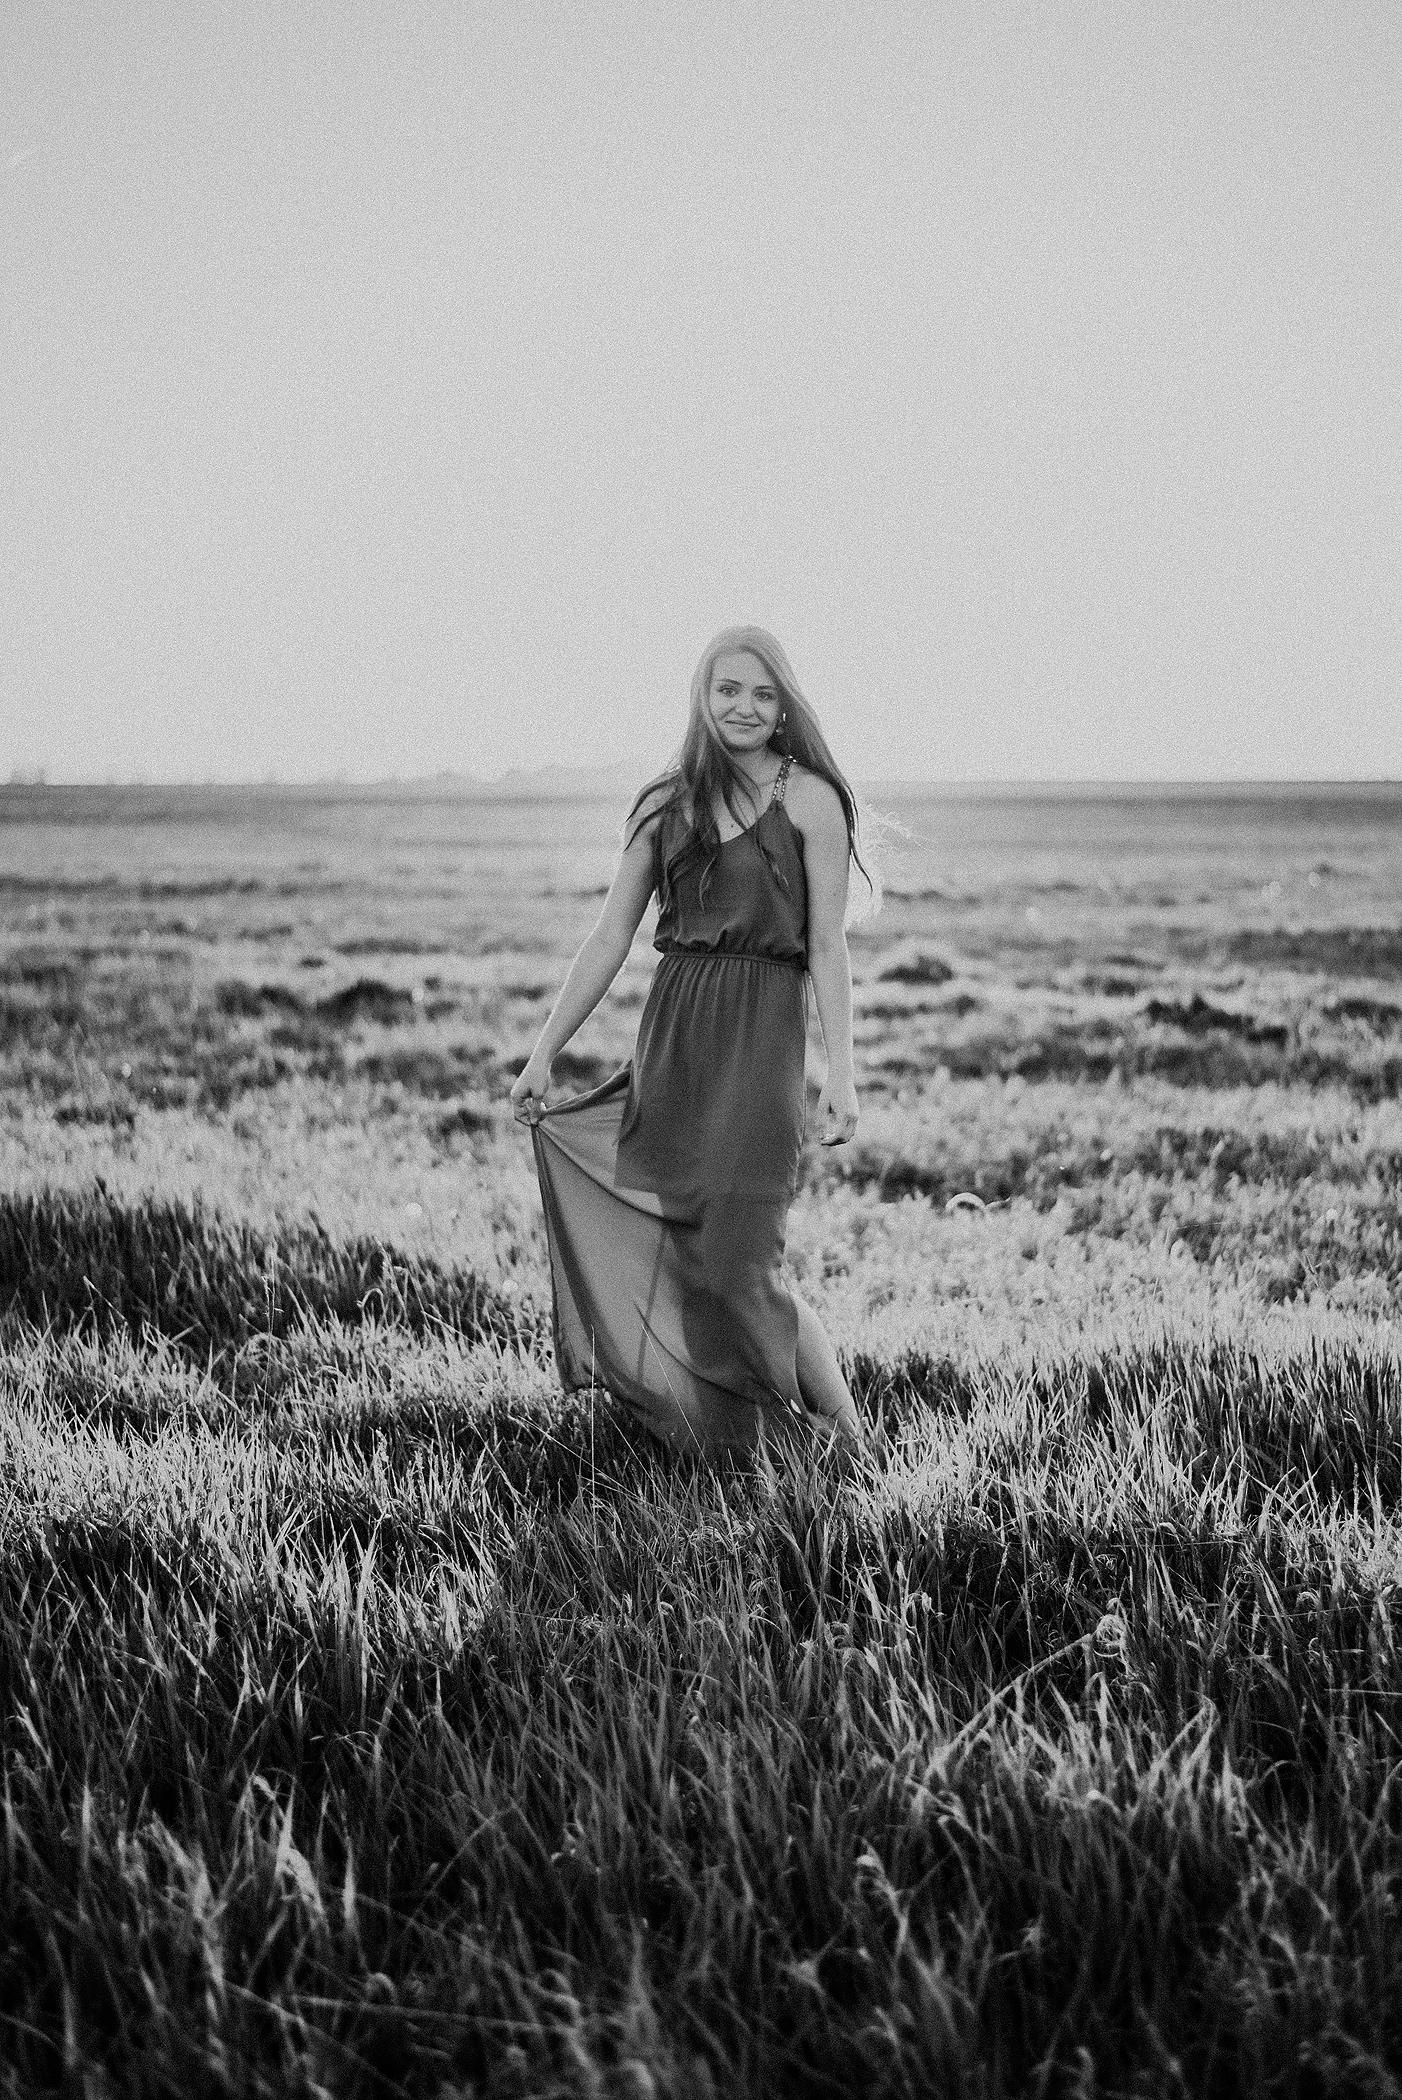 kaylie-sirek-central-nebraska-senior-portrait-photographer-photography-grand-island-kearney-hastings-lincoln-43.png